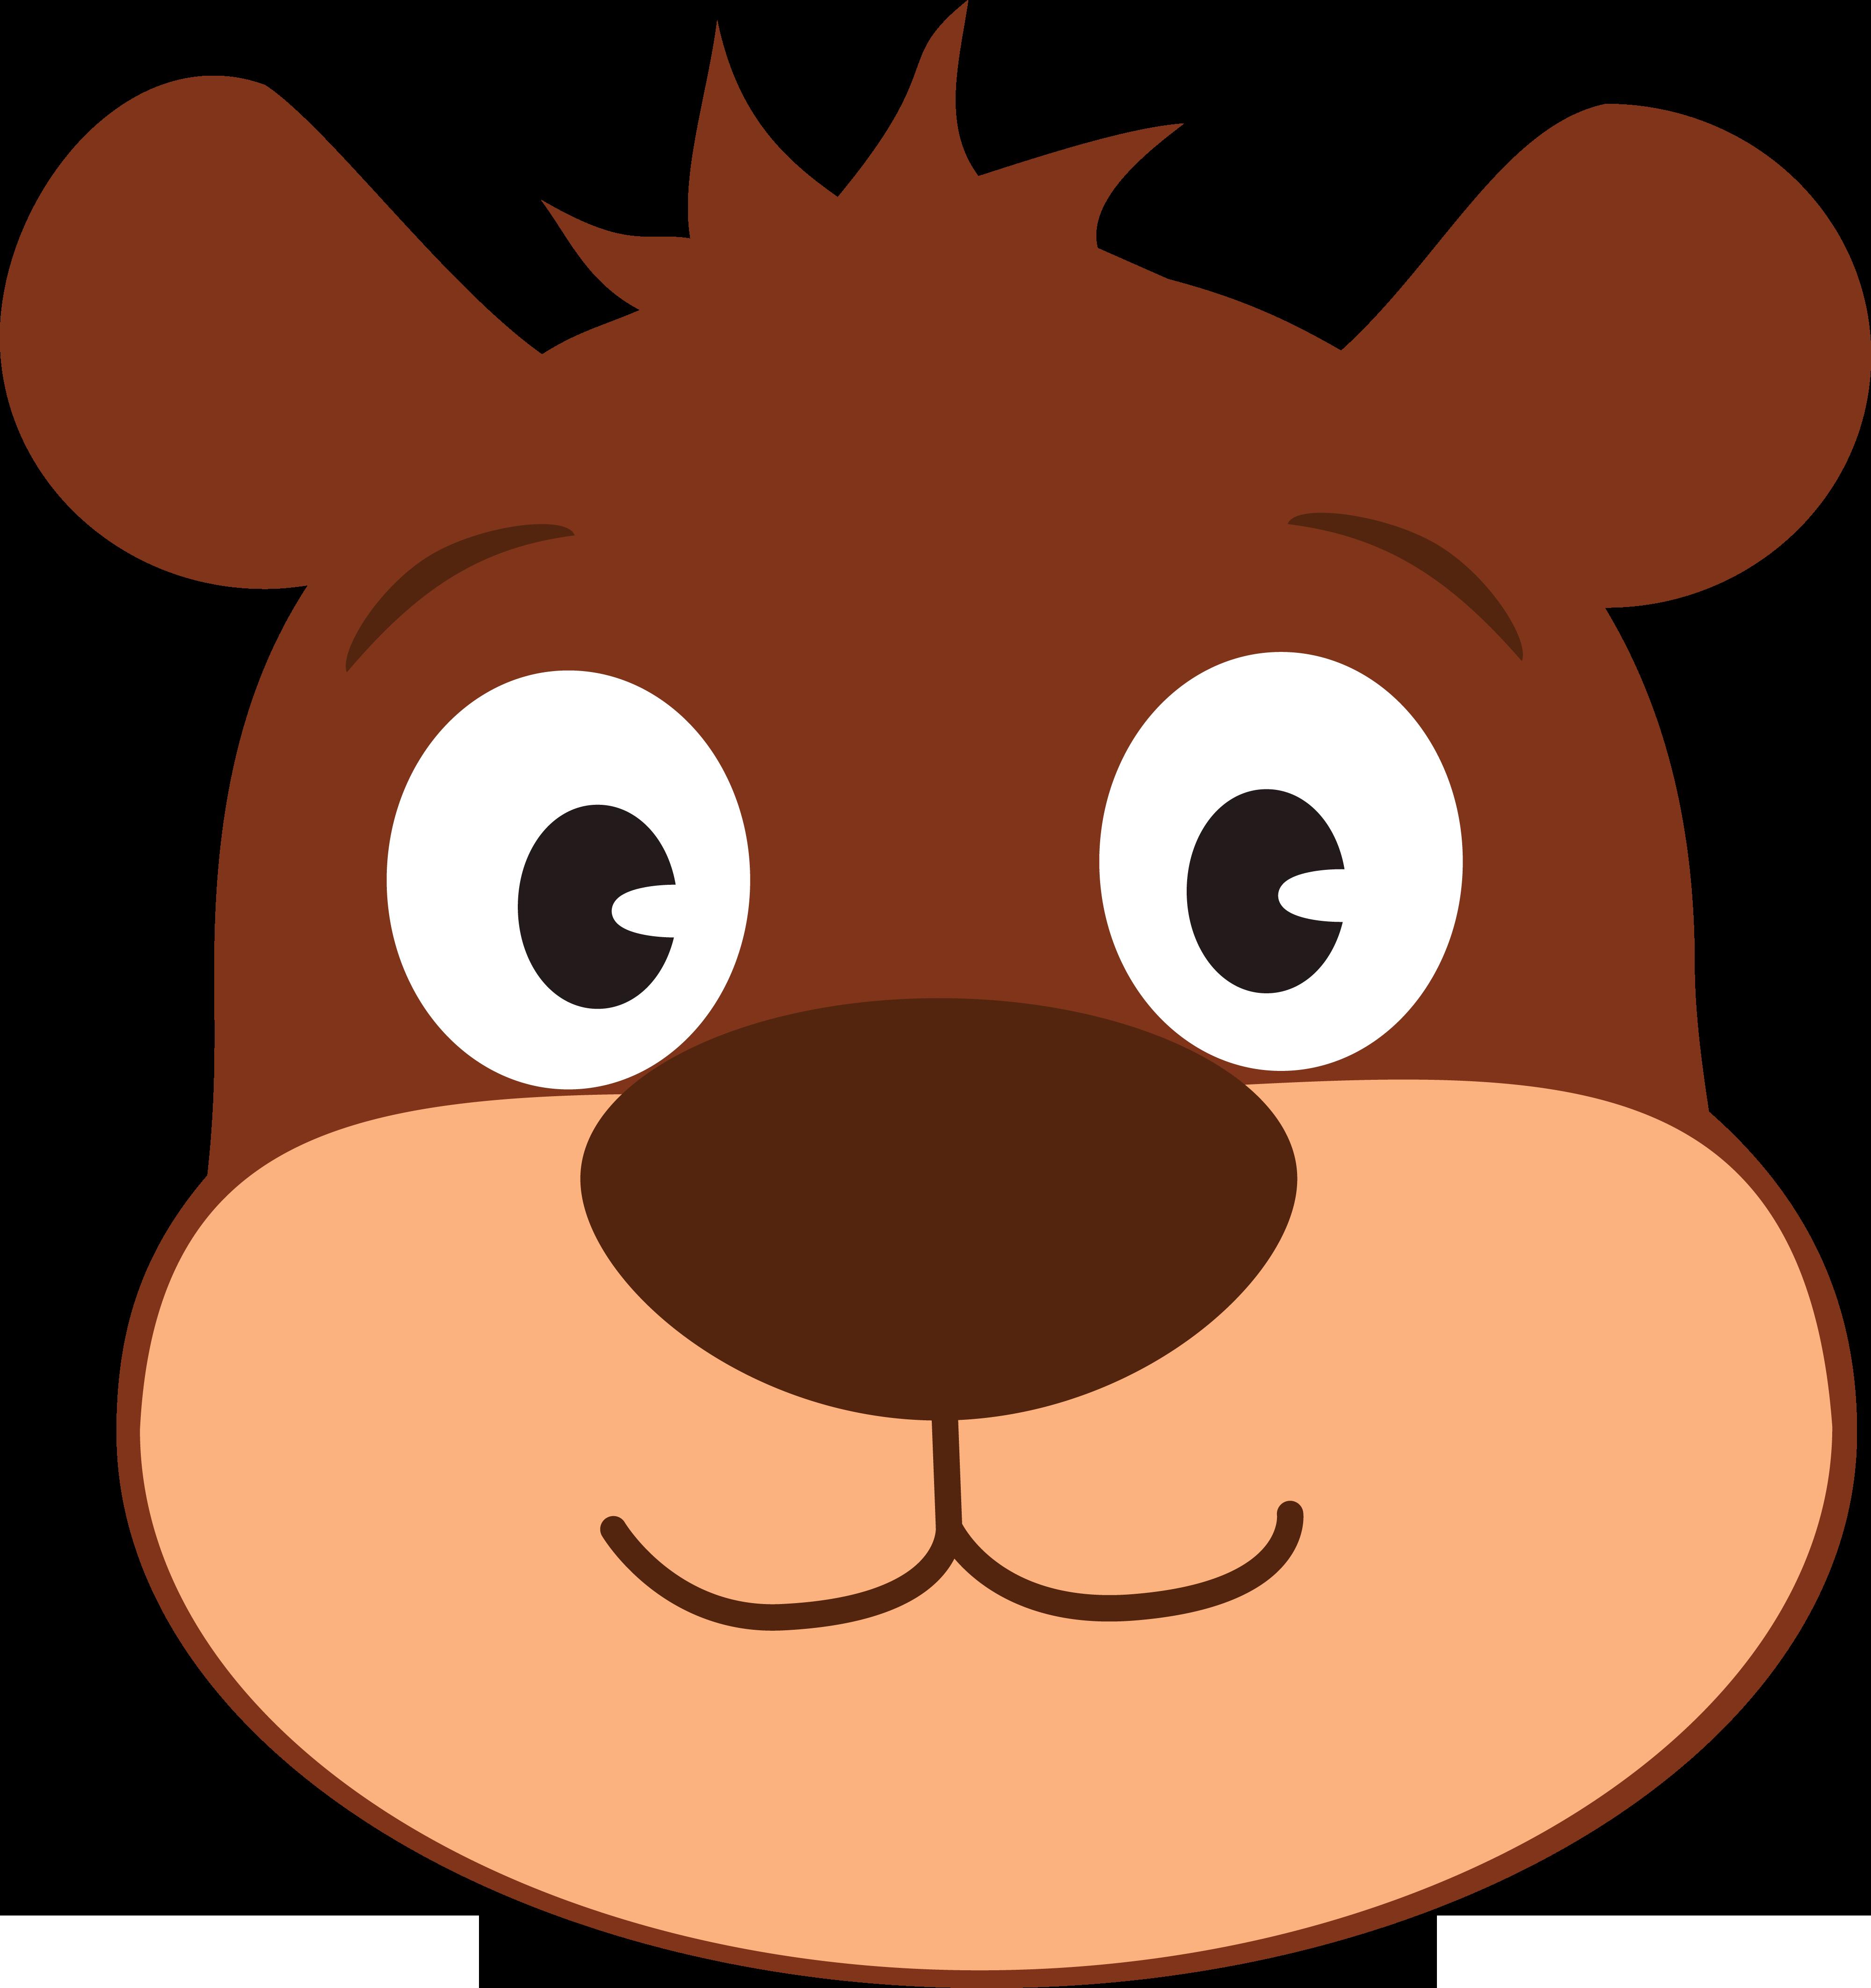 4000x4251 Free Clipart Of A Cute Bear Face